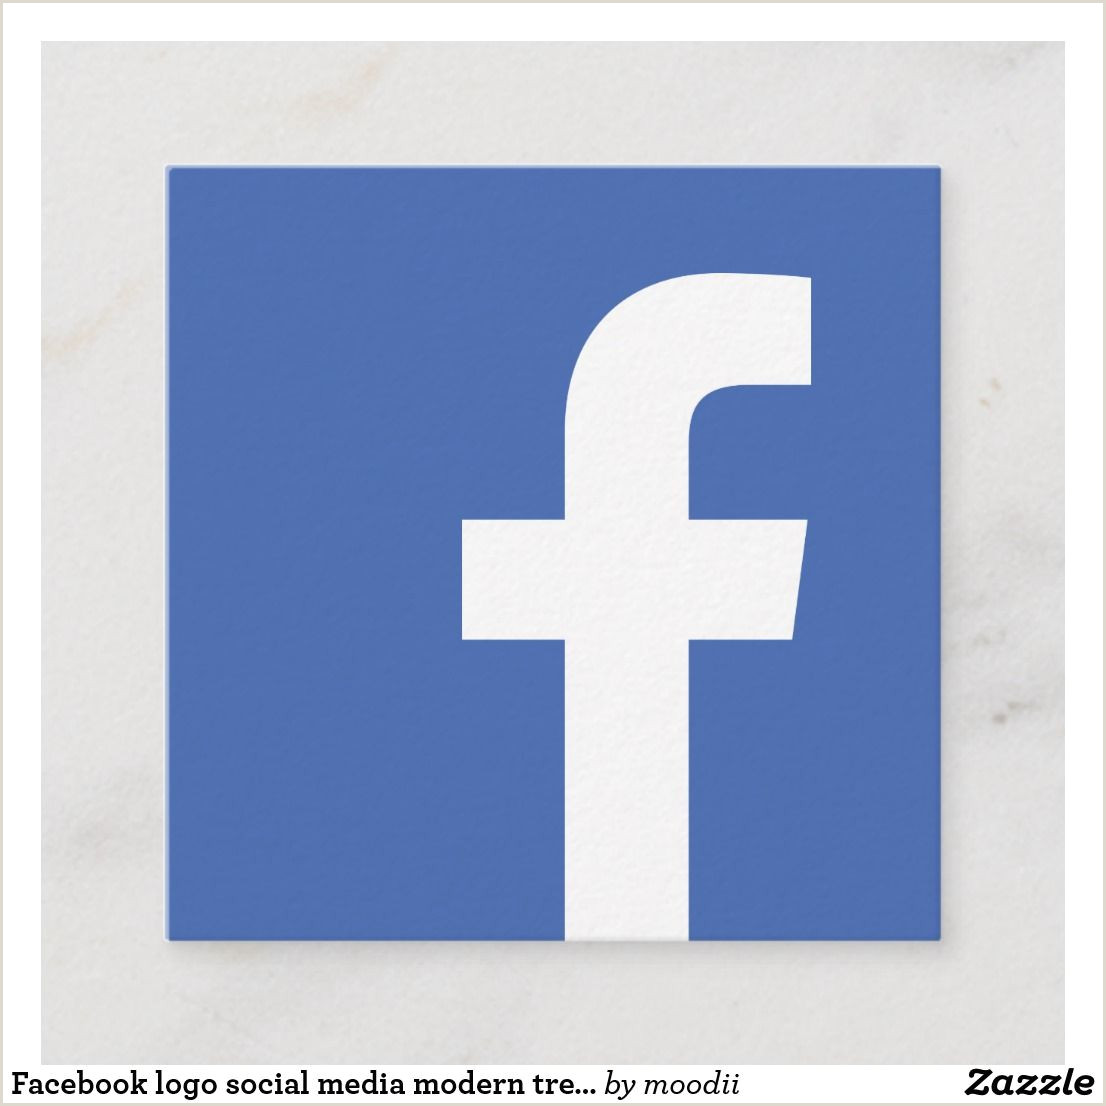 Social Media Symbols For Business Cards Social Media Logo Business Cards